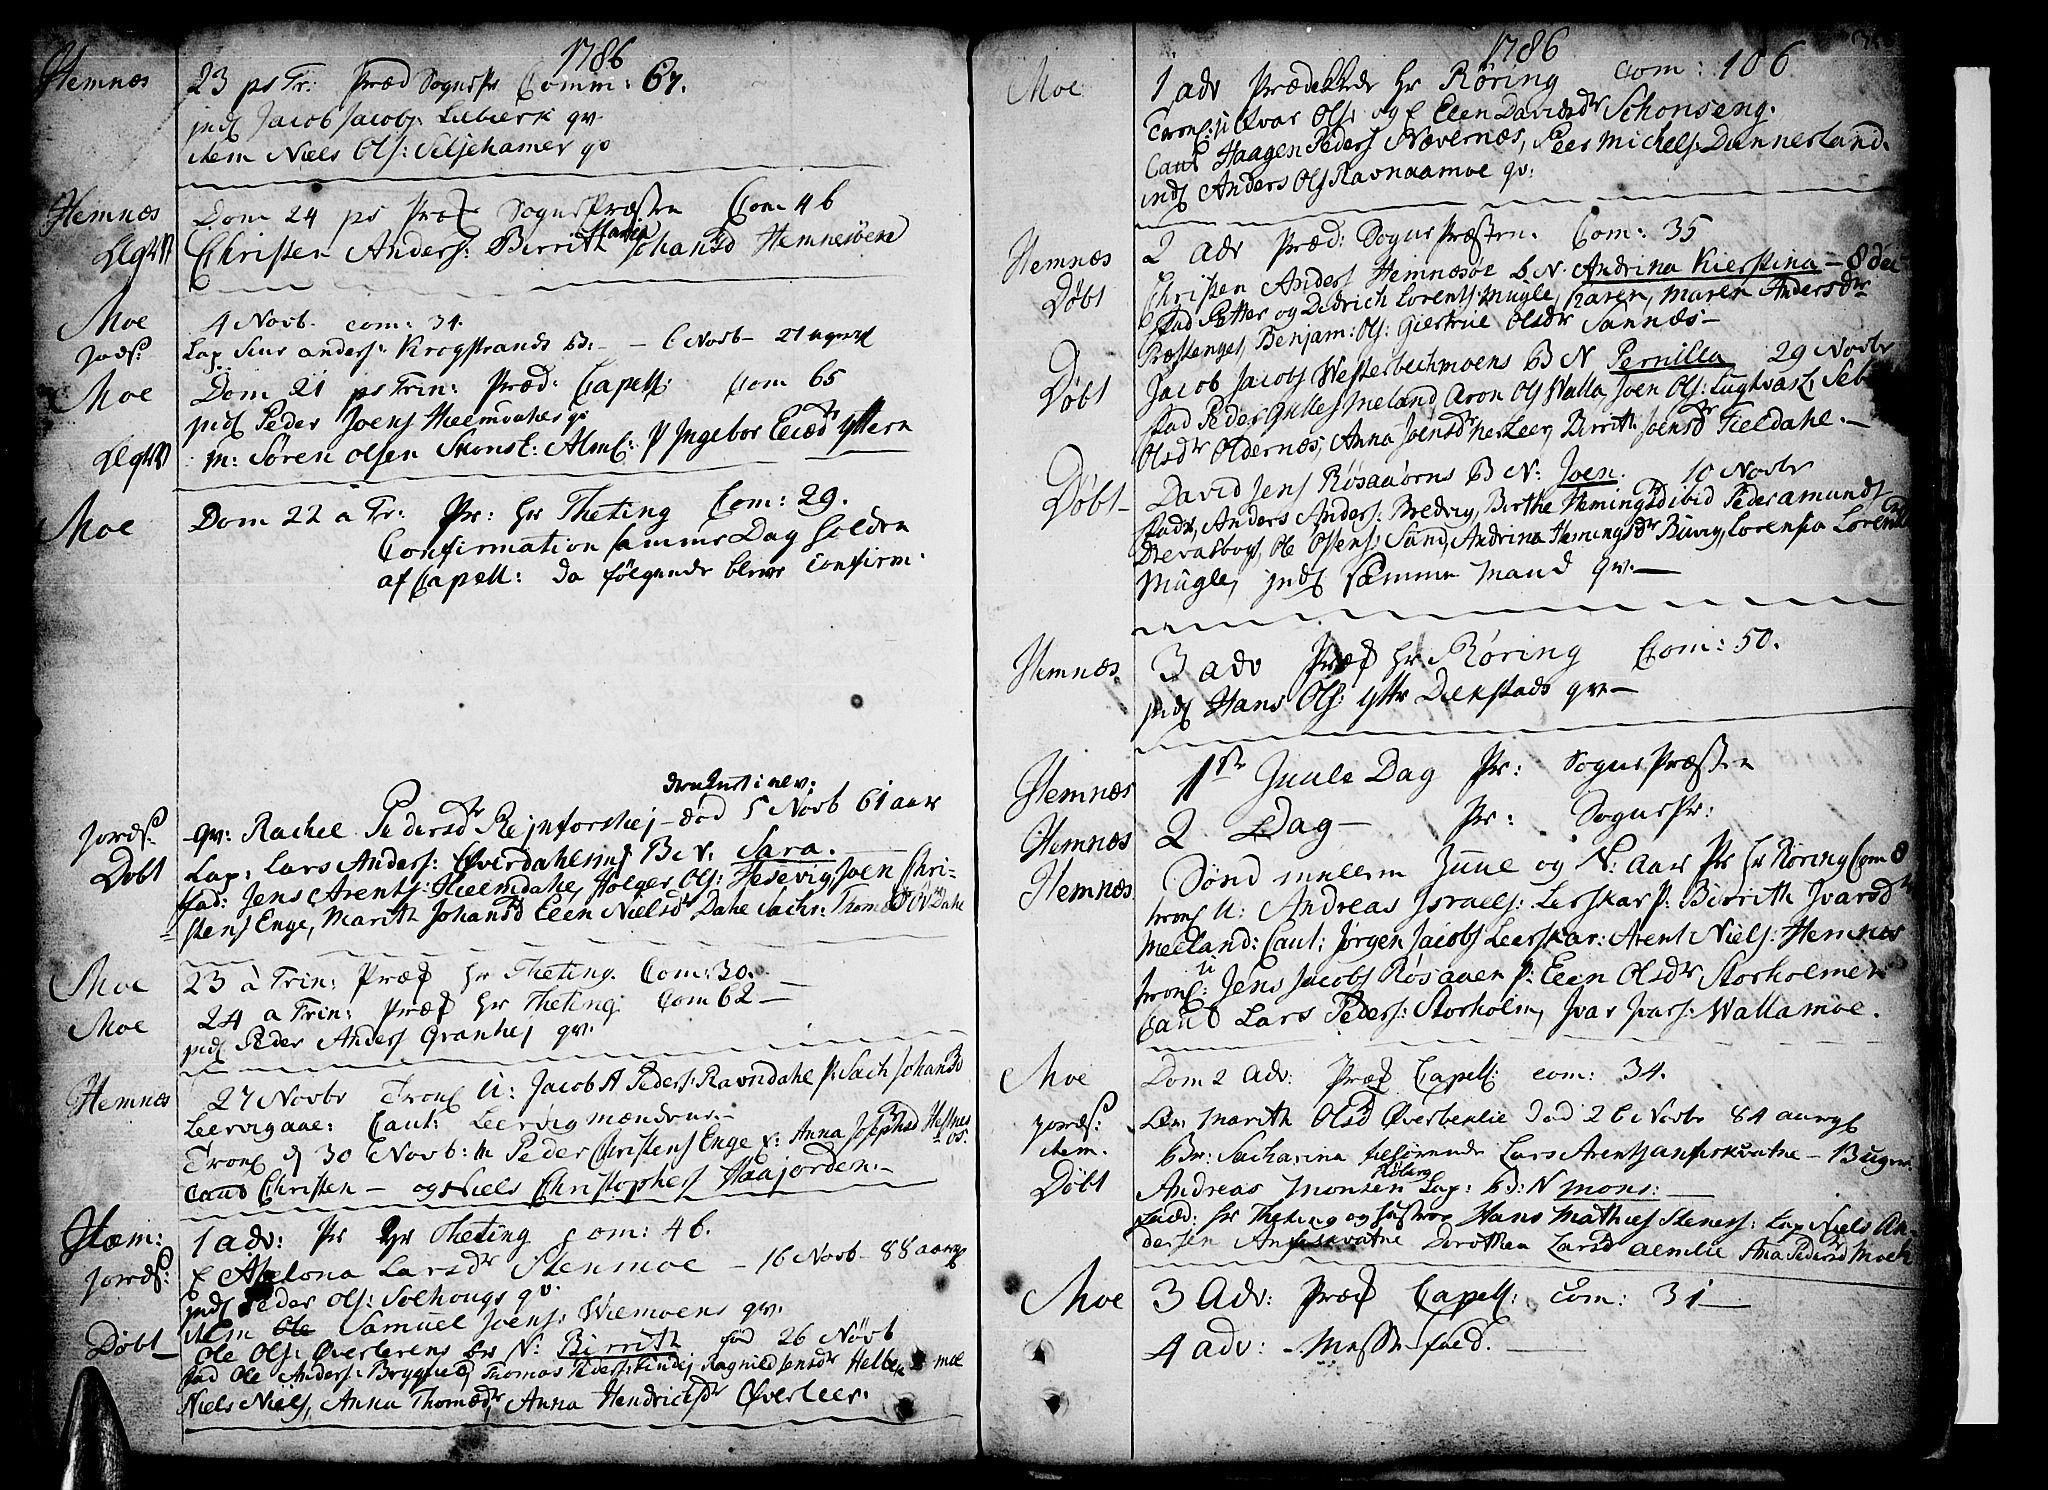 SAT, Ministerialprotokoller, klokkerbøker og fødselsregistre - Nordland, 825/L0348: Ministerialbok nr. 825A04, 1752-1788, s. 356